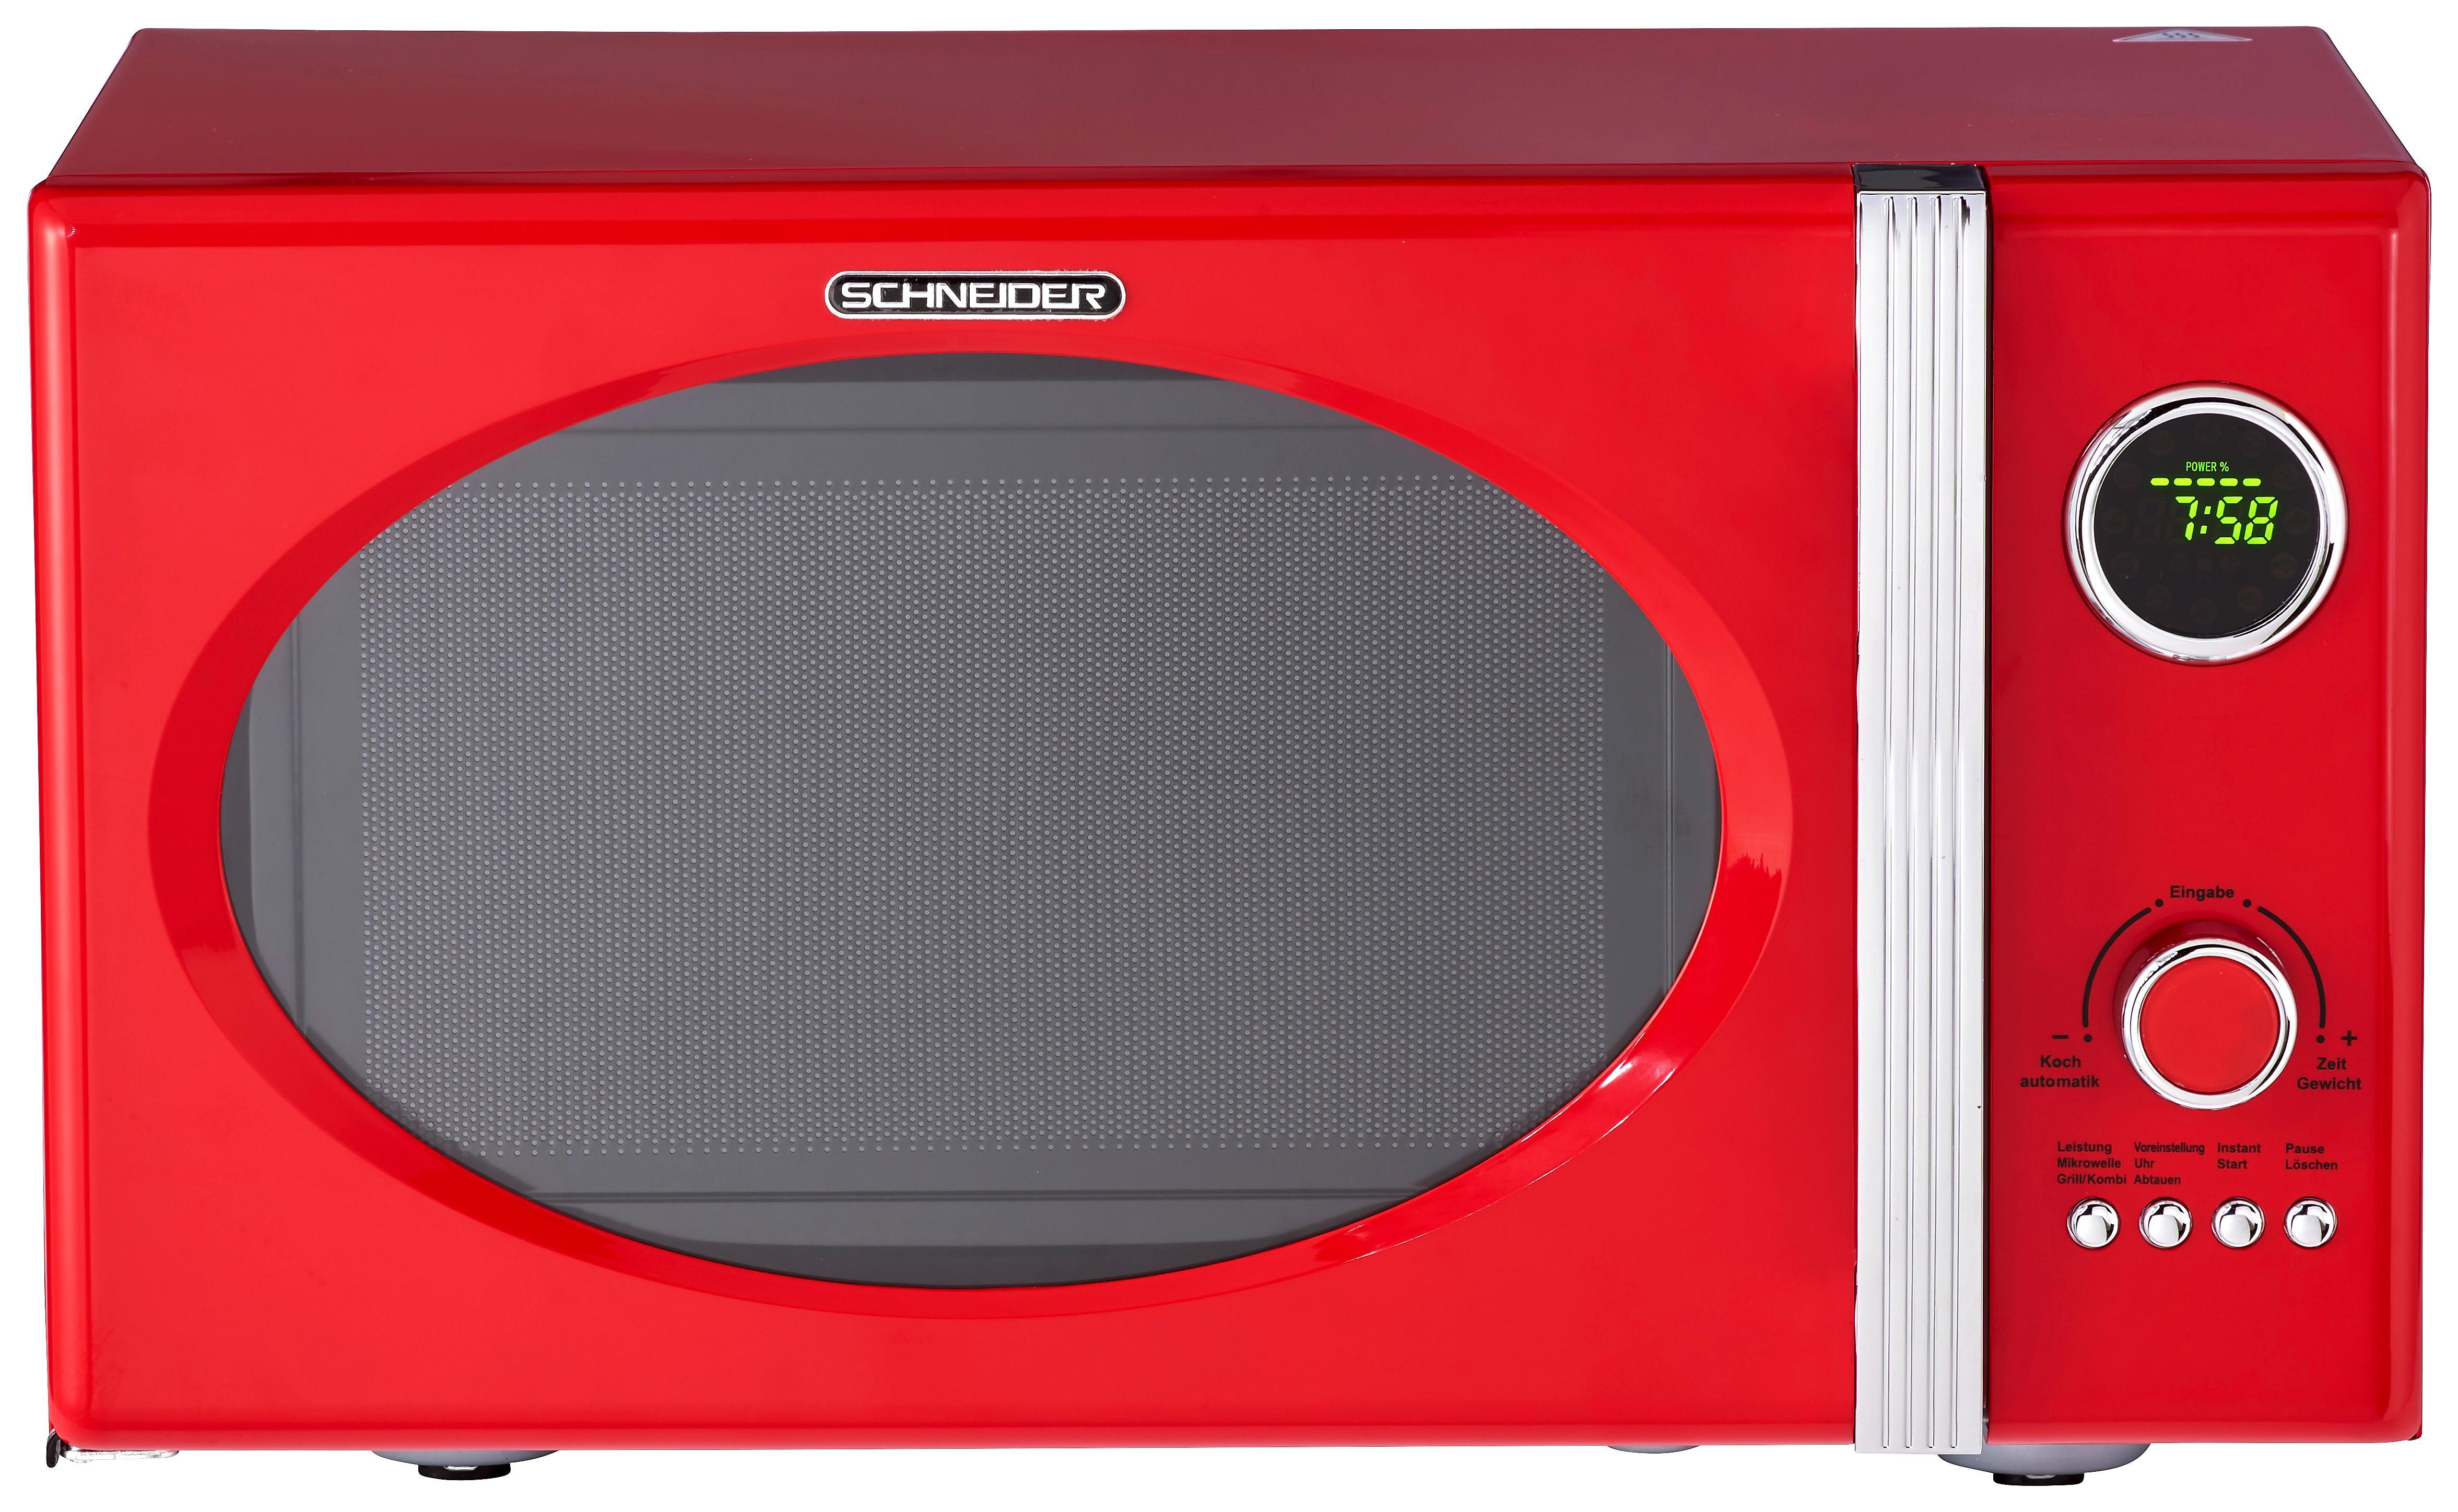 Mikrowelle in knalligem Rot online kaufen